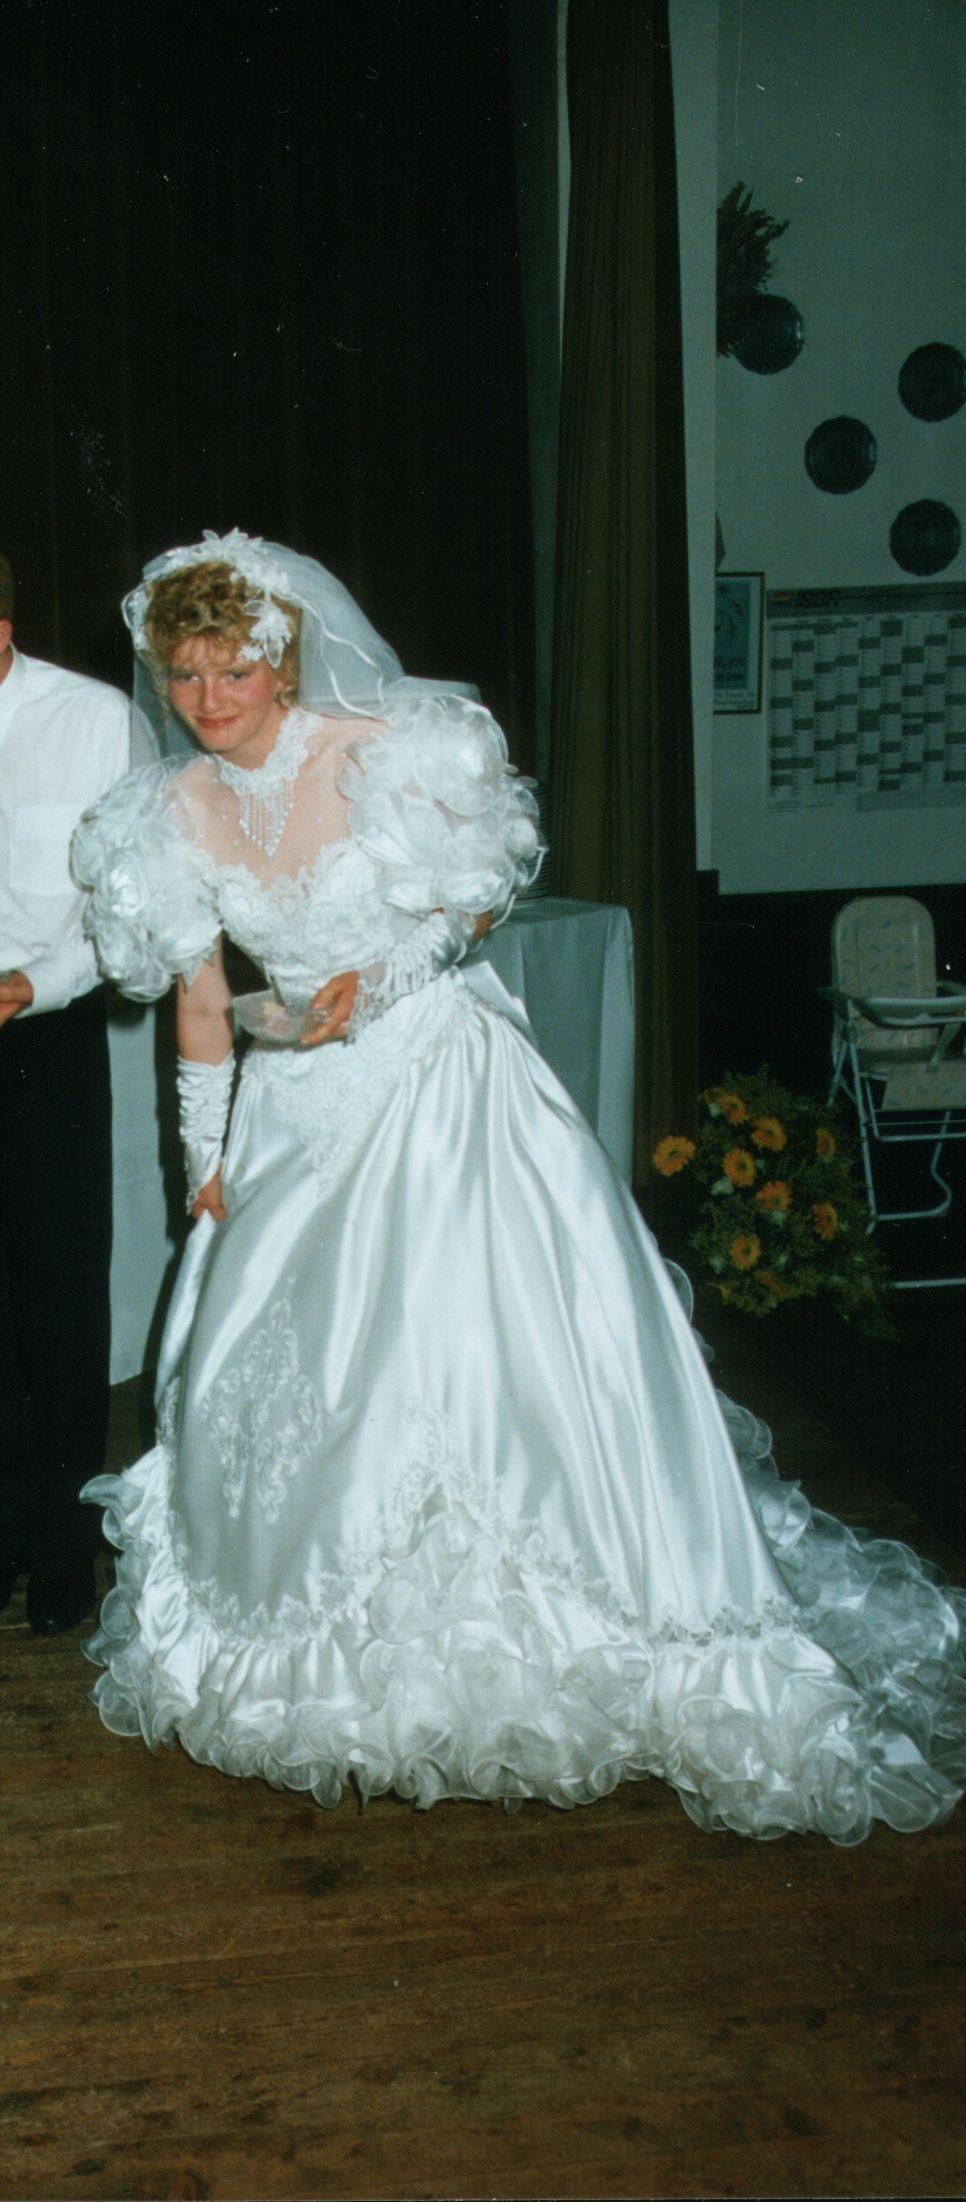 Traumkleid 1992 In 2021 Wedding Dresses Taffeta Wedding Dresses 80s Wedding Dresses Vintage [ 2202 x 966 Pixel ]